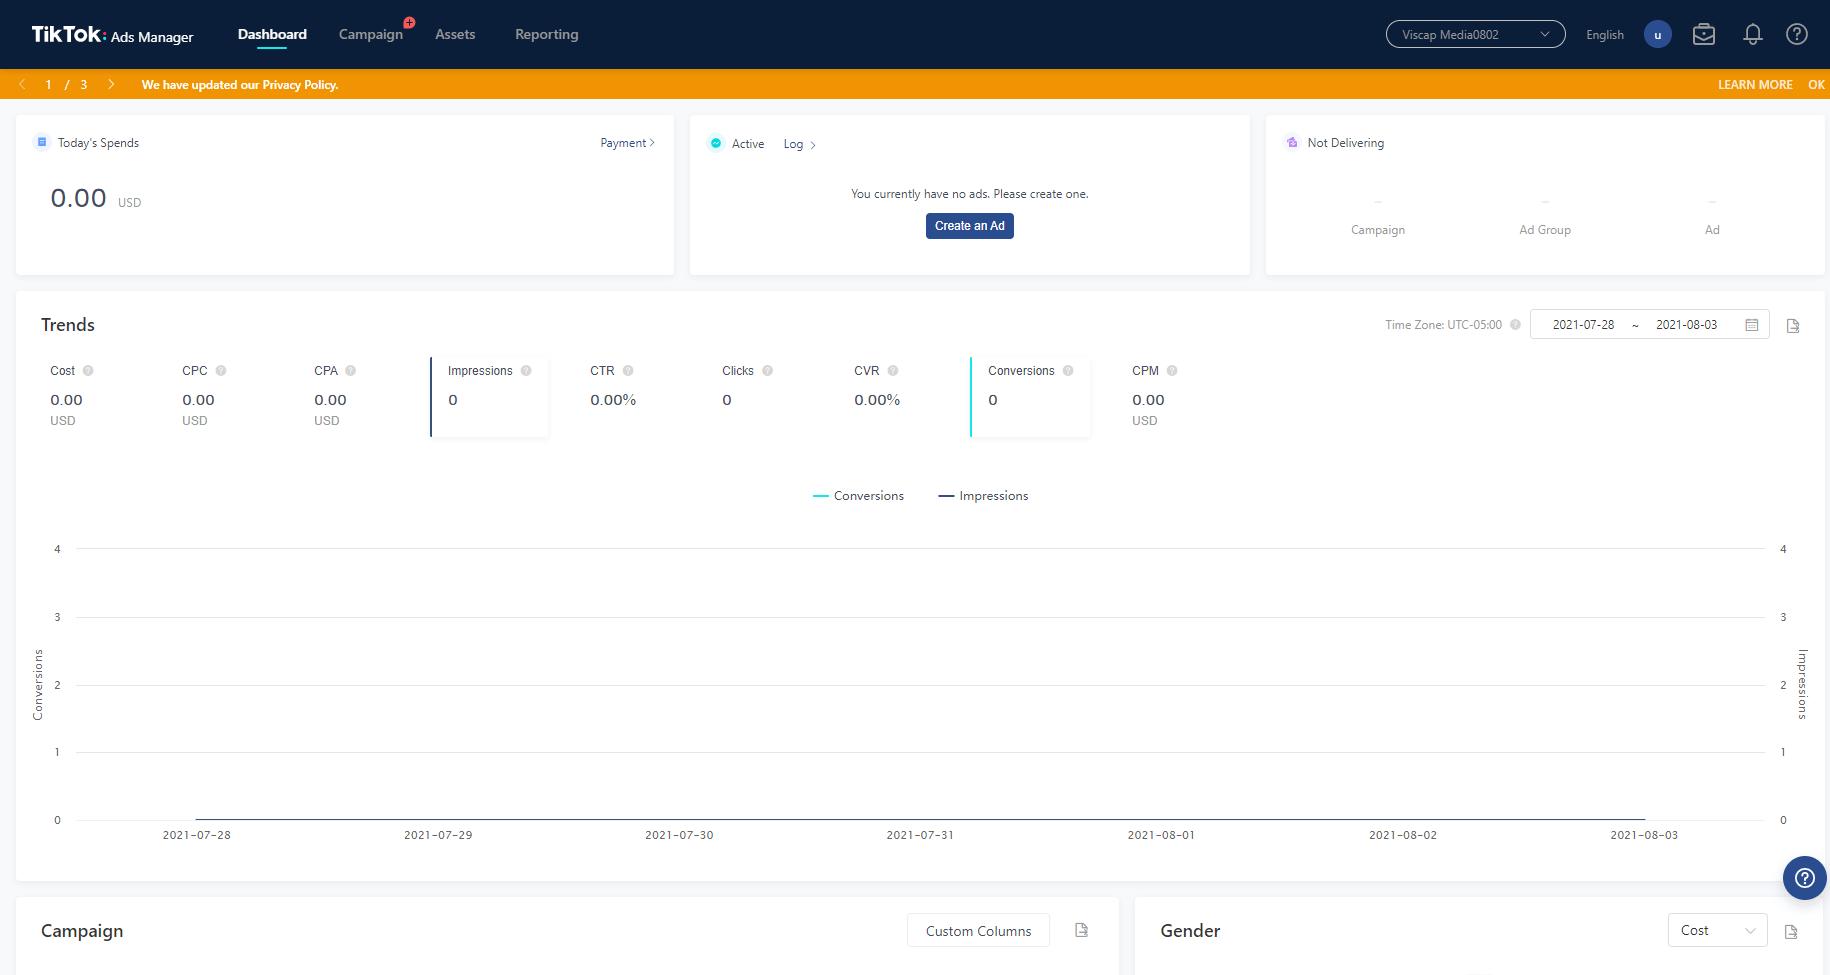 Advertise on TikTok Campaign Dashboard Screenshot